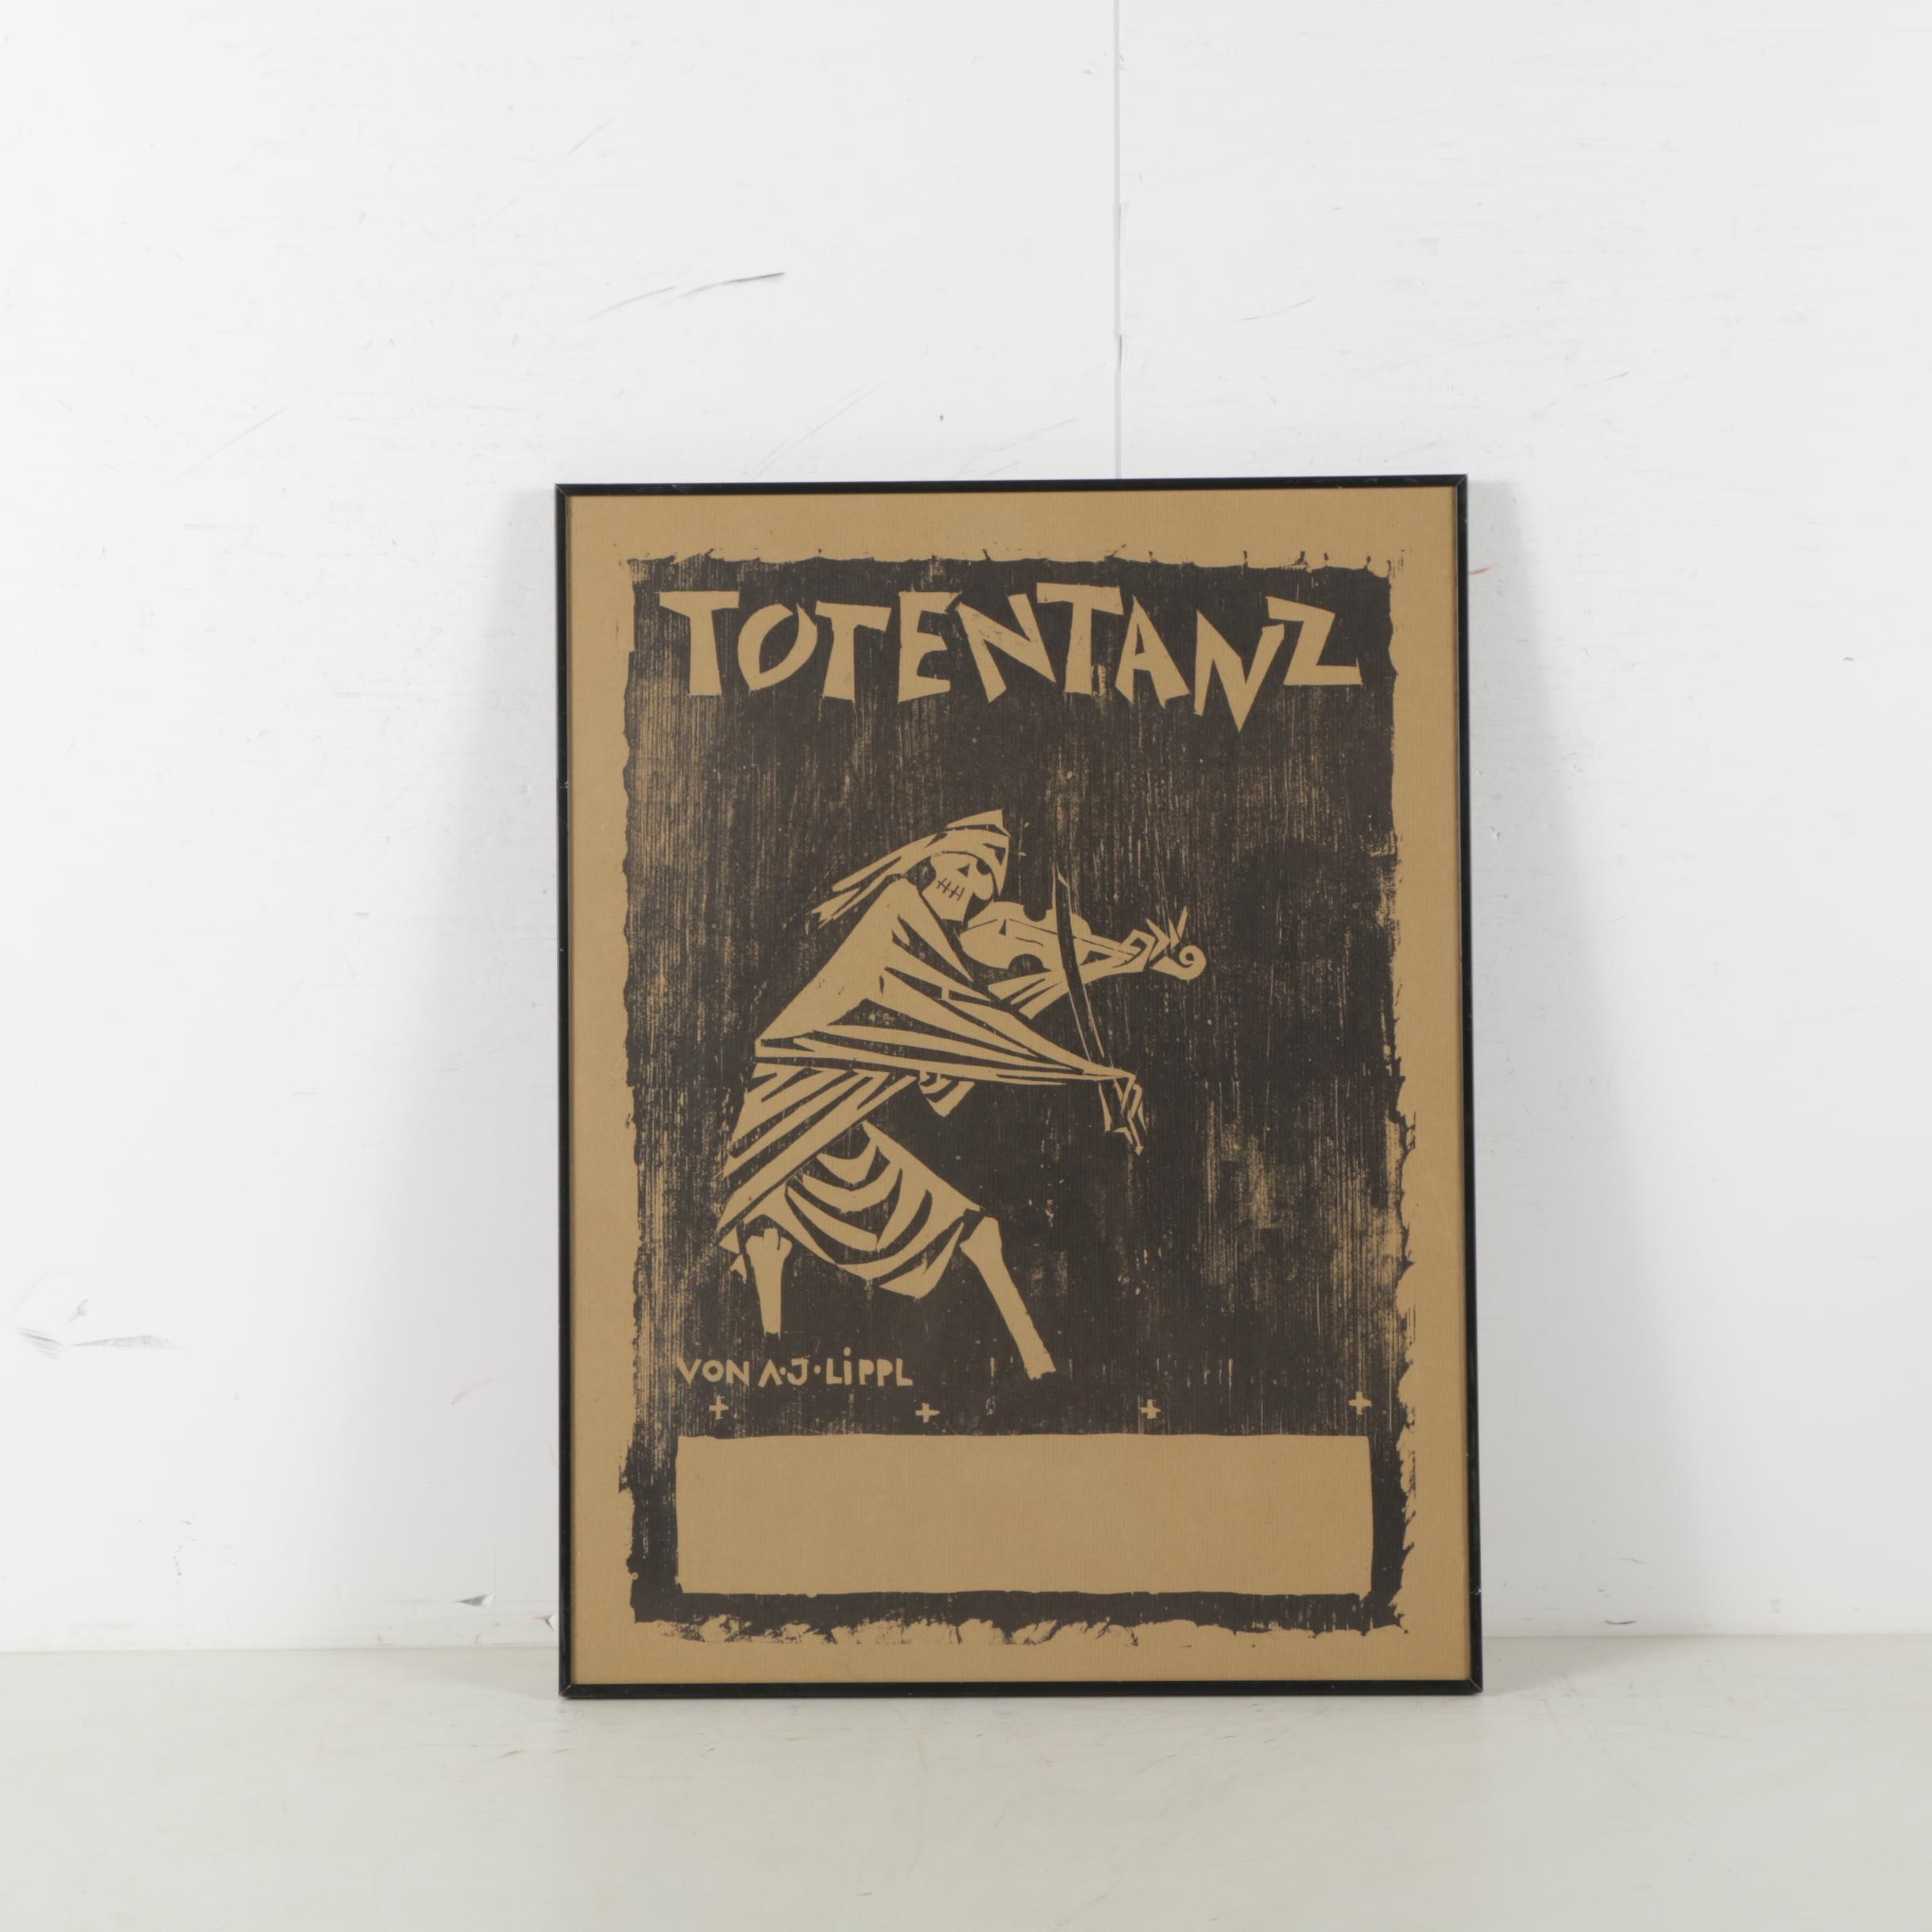 Woodcut Print Totentanz Show Bill Poster